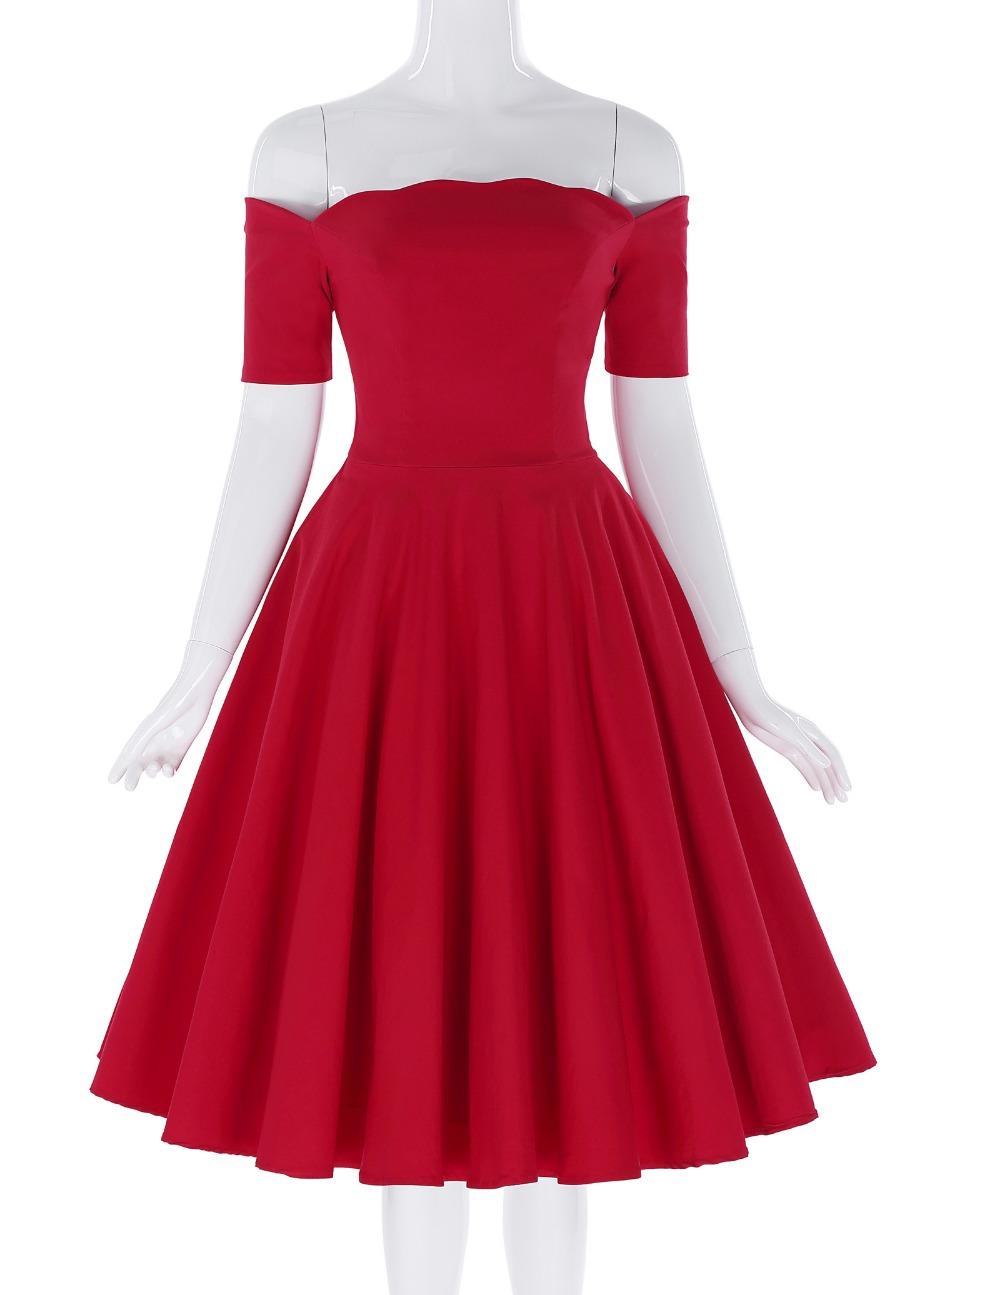 Belle Poque 17 Women Dress Robe Vintage Off Shoulder Black Summer Dress Jurken 1950s 60s Retro Rockabilly Swing Party Dresses 18